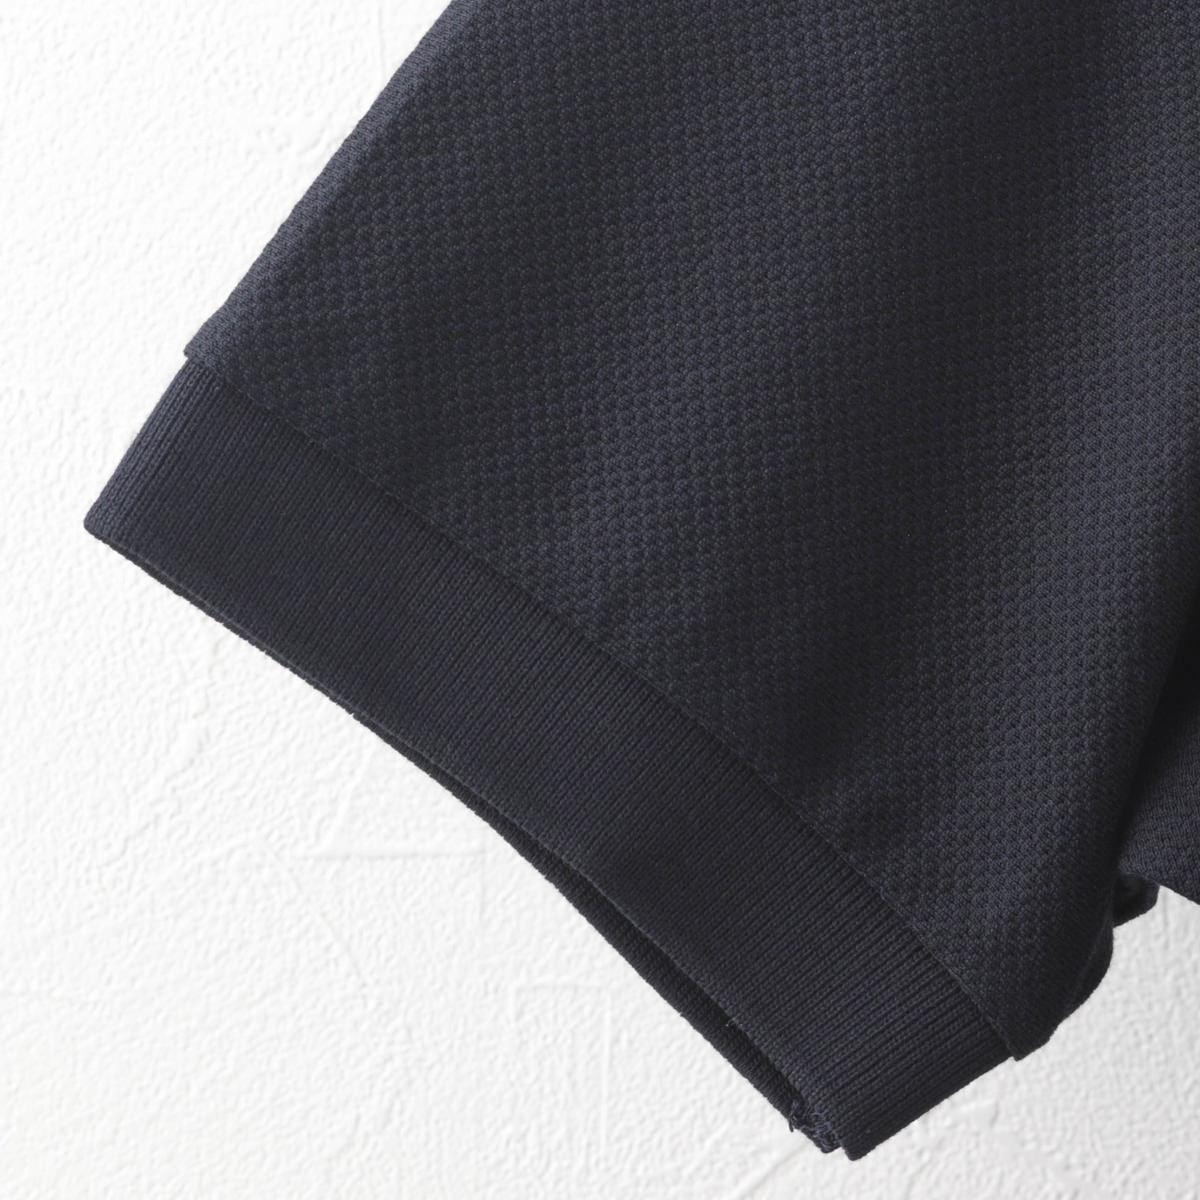 Fred Perry フレッドペリー メンズ ピケ ポロシャツ 半袖 コットン ネイビー ストライプ 異素材MIX プレッピー 正規販売店